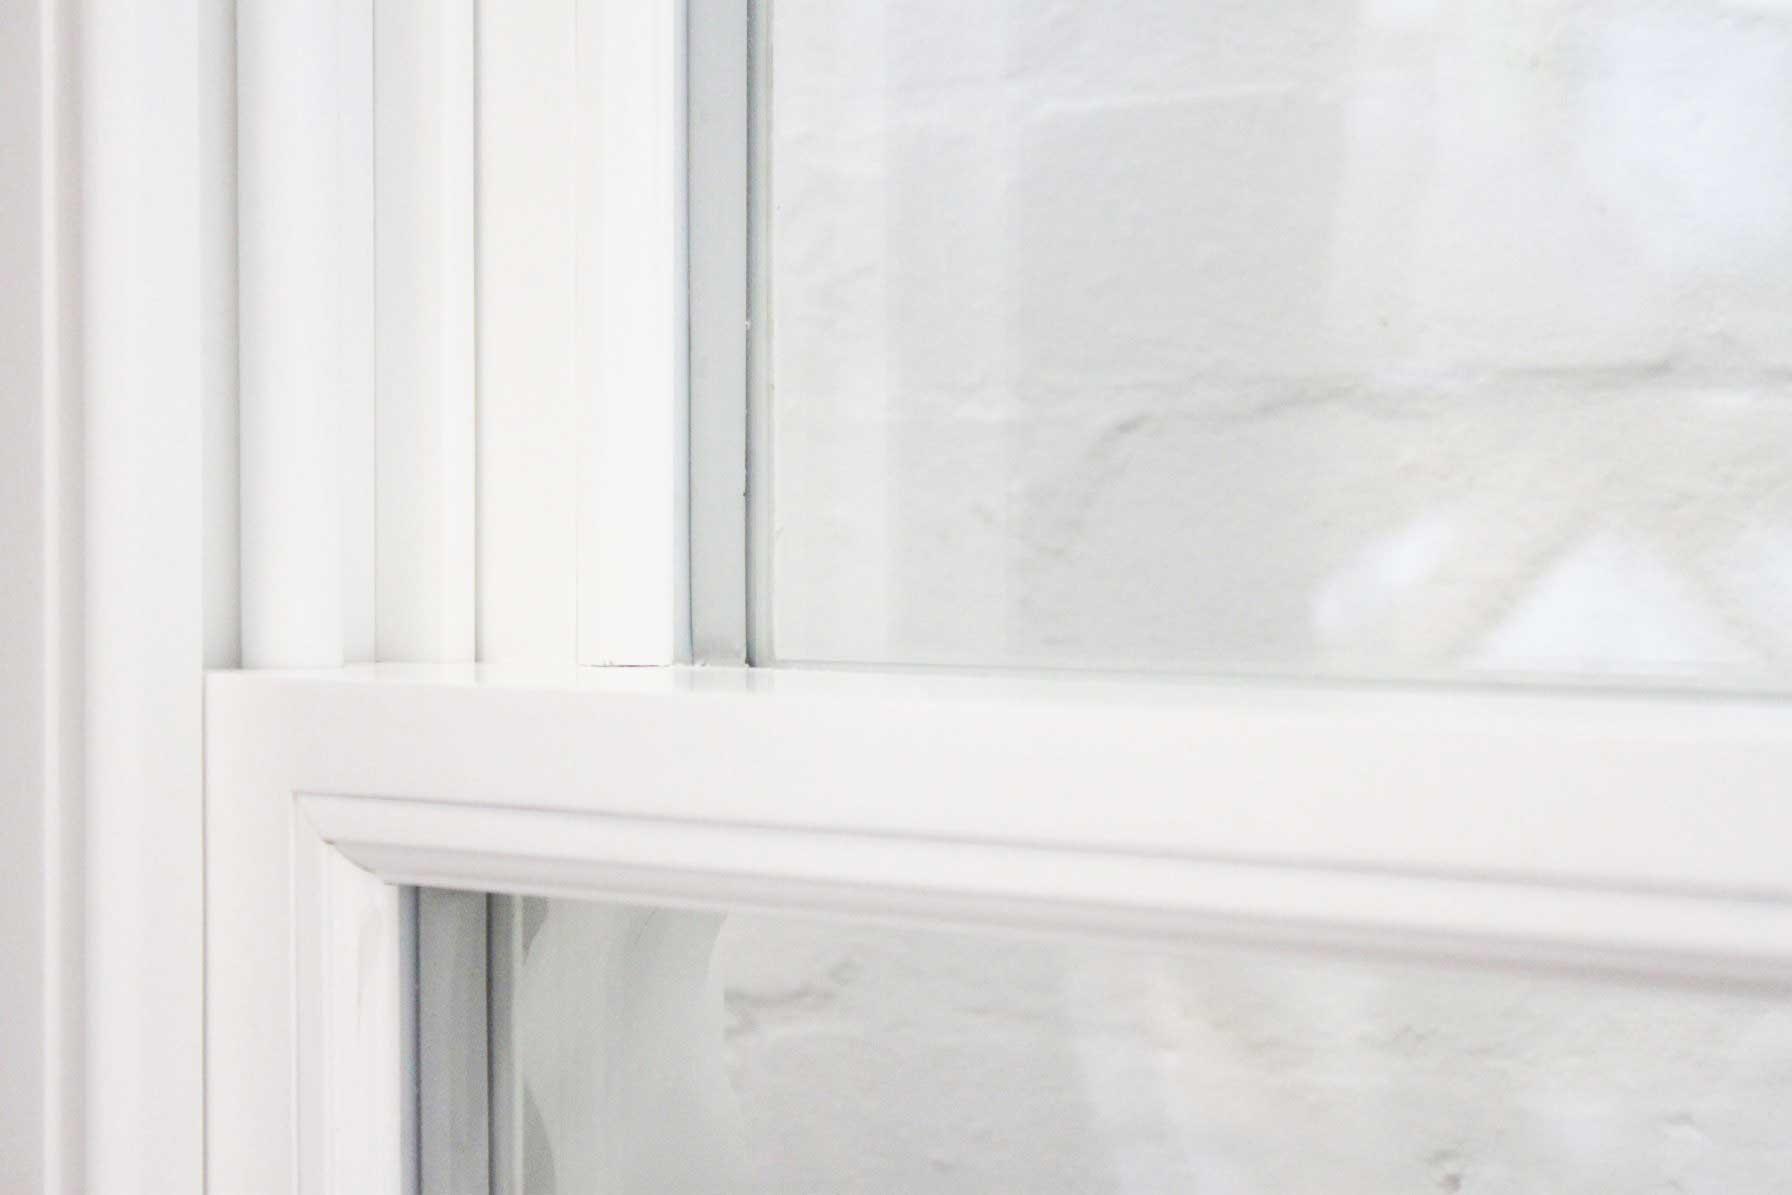 sash windows london design